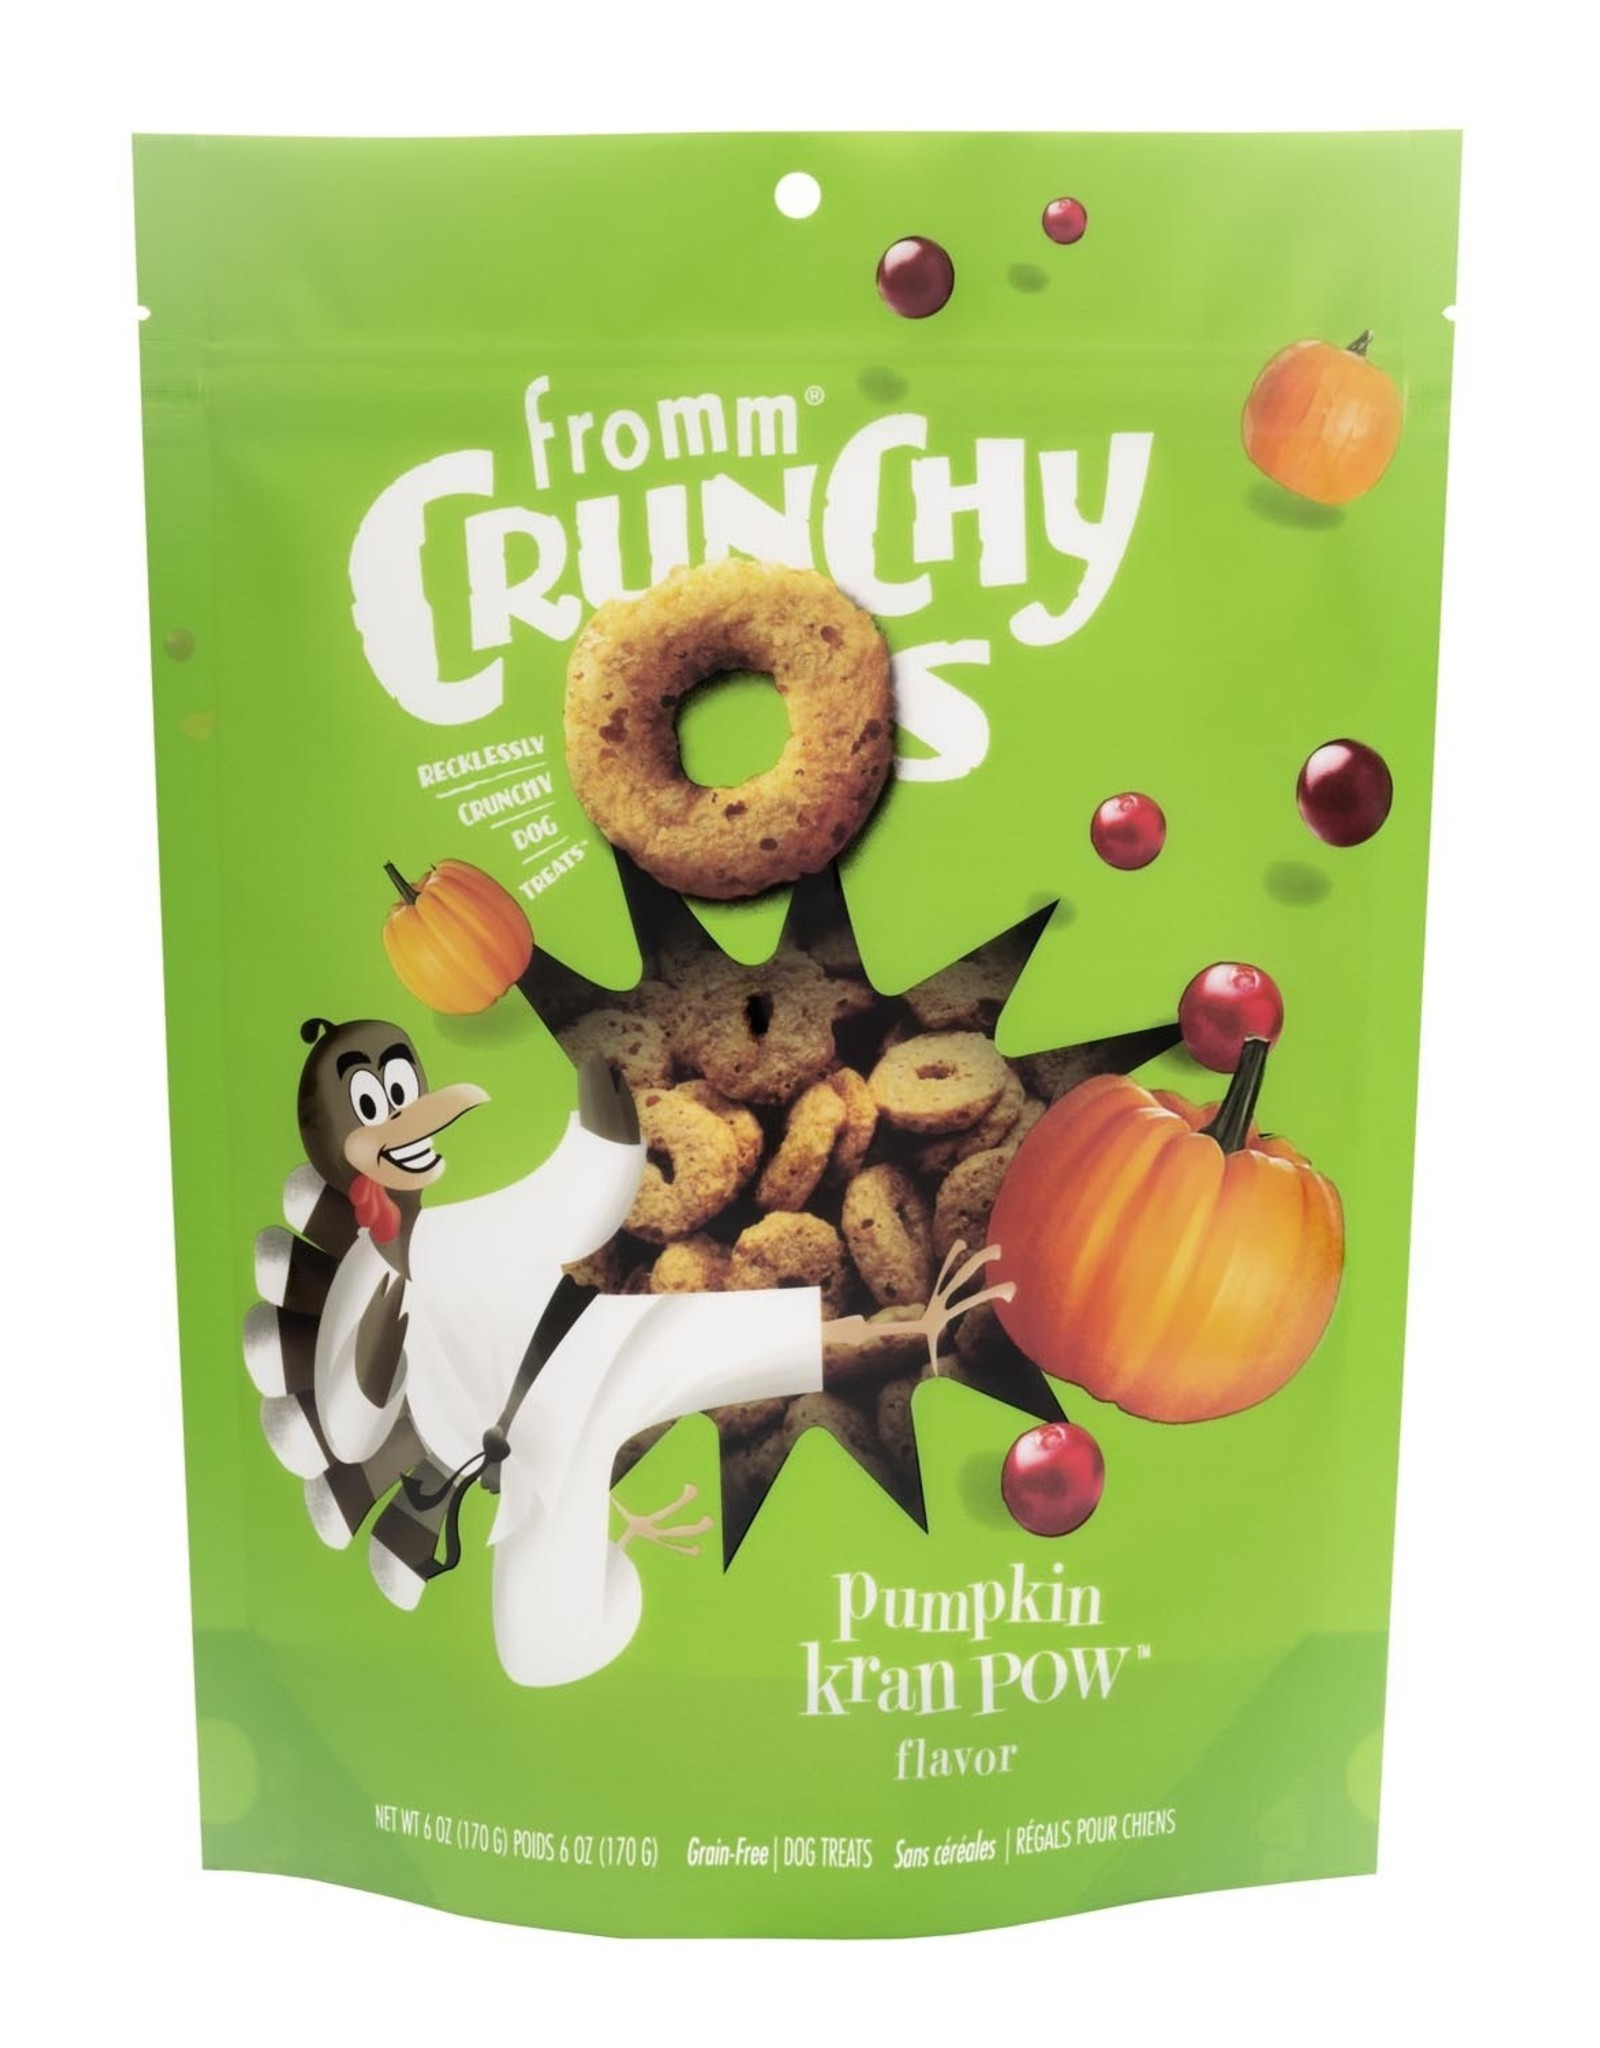 Fromm Fromm Crunchy O's: Pumpkin Kran Pow, 6 oz